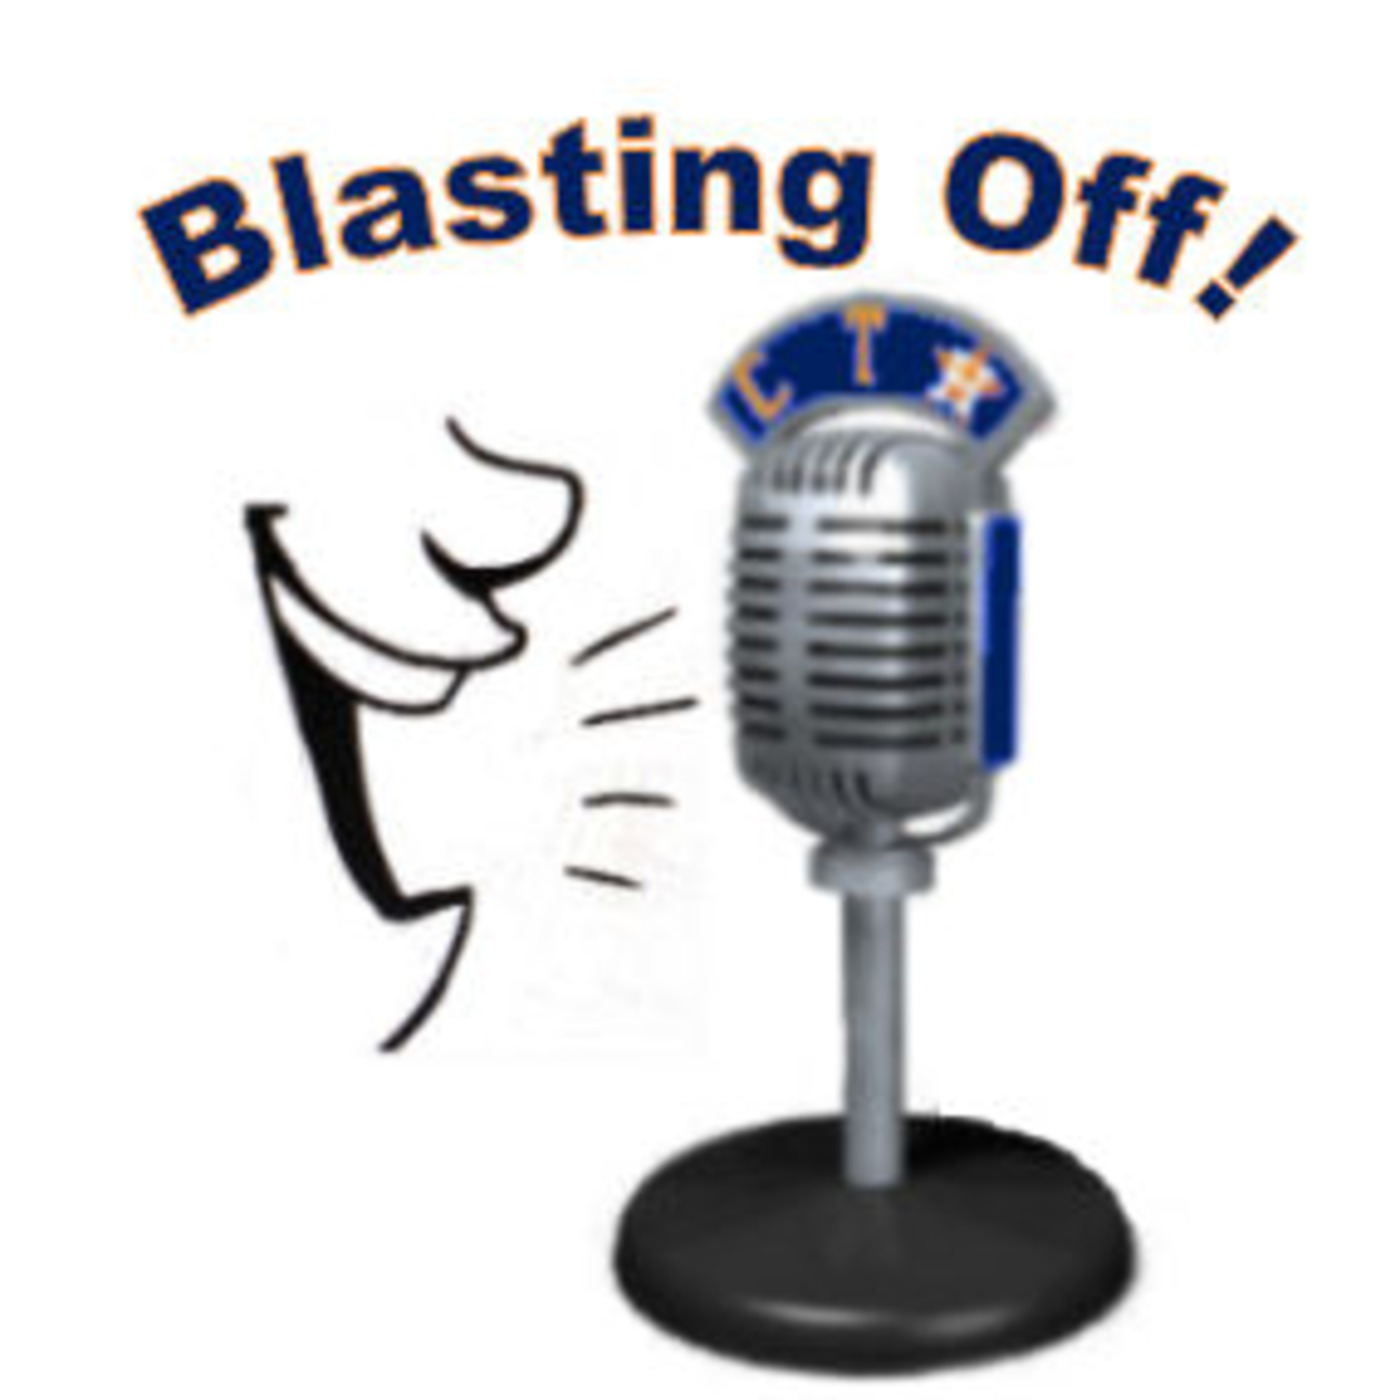 Blasting Off: The Aiken Debate